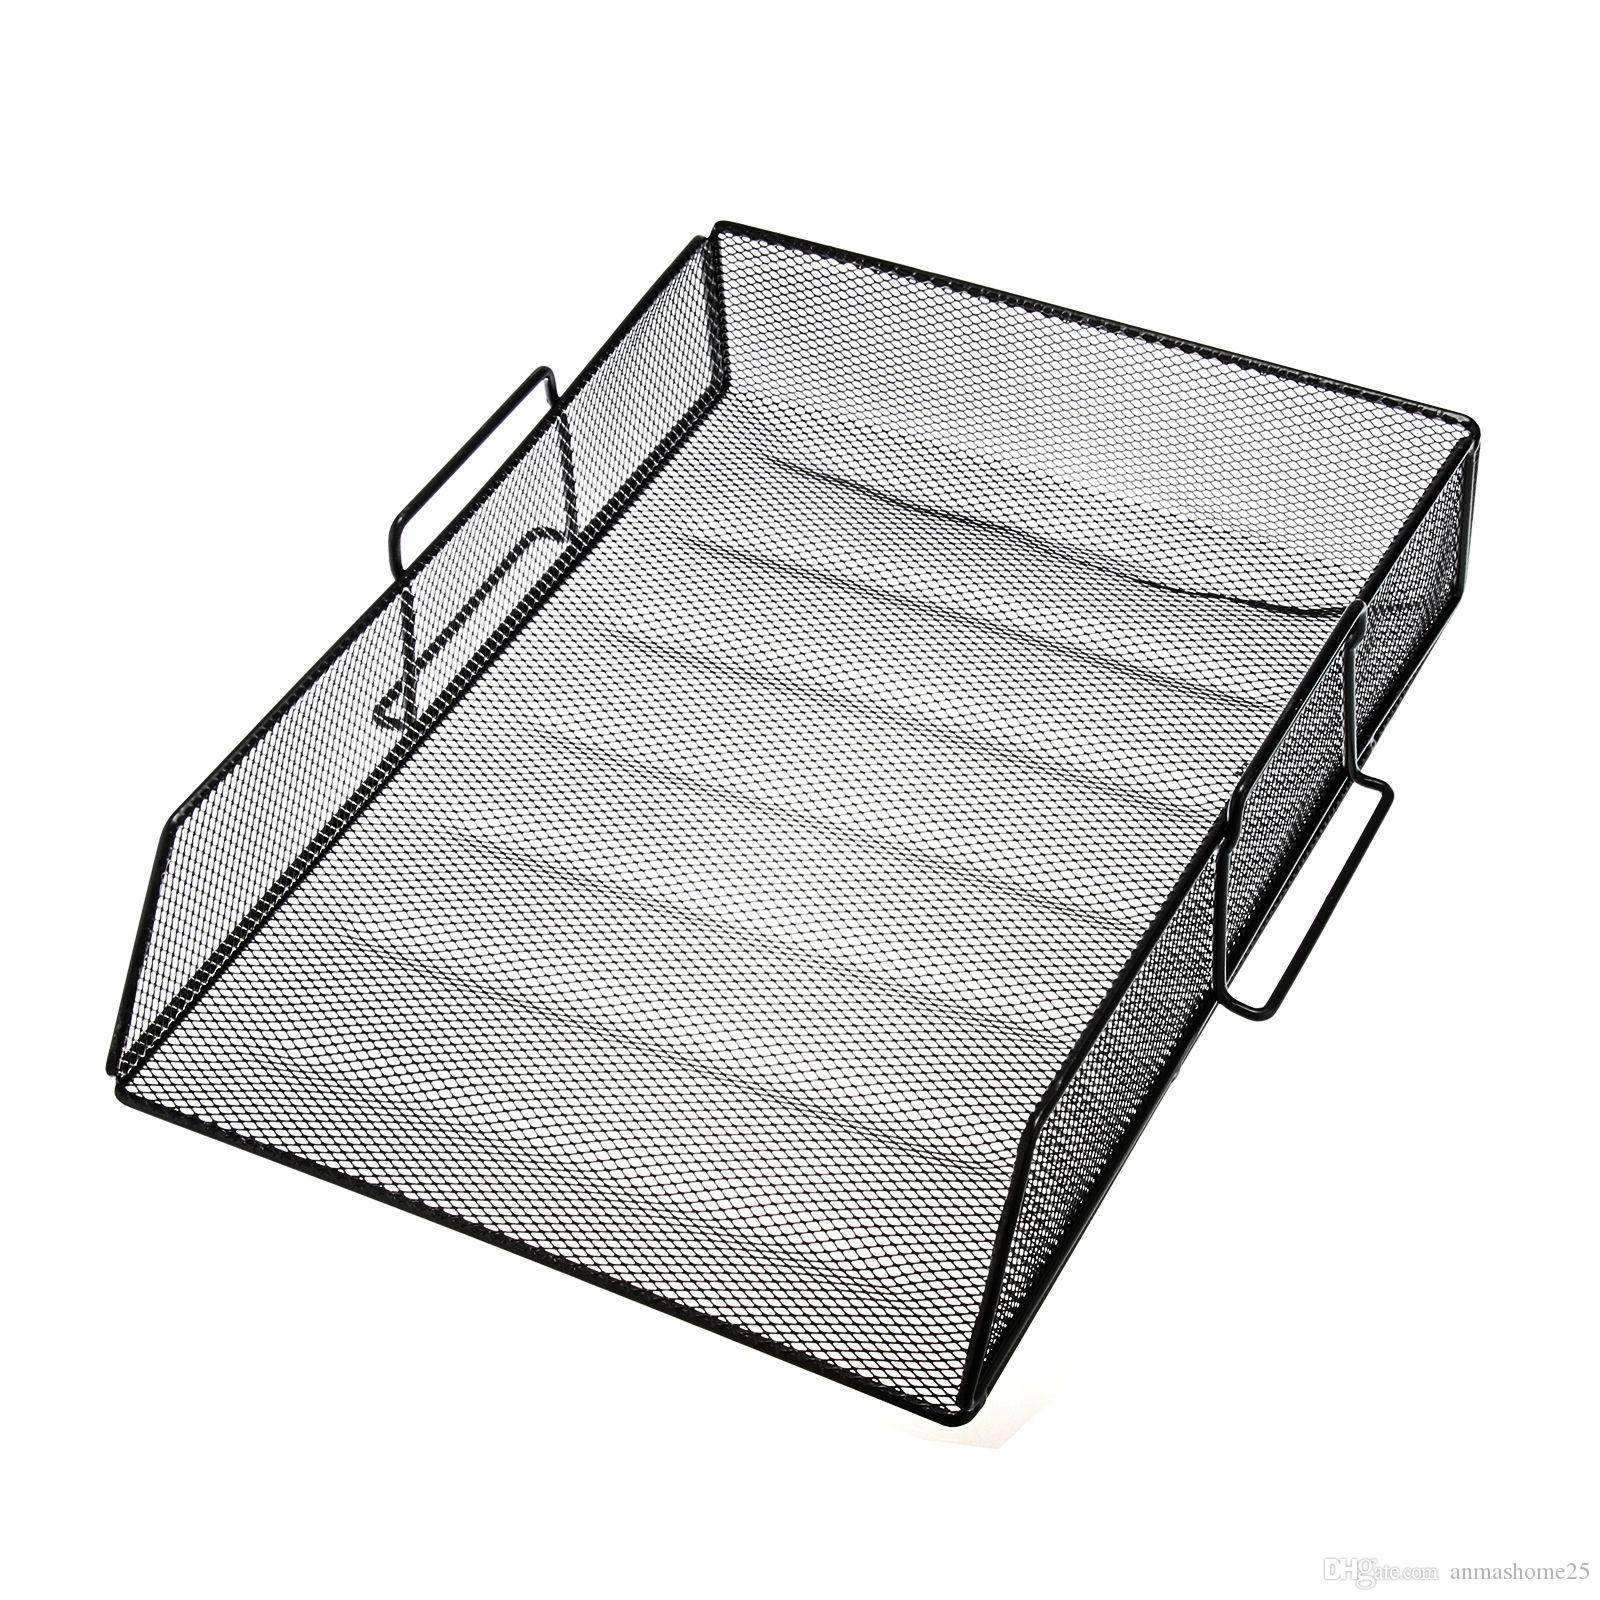 2018 Black One Compartment Metal Mesh Desktop File Sorter Desk Tray Organizer From Anmashome25 22 11 Dhgate Com